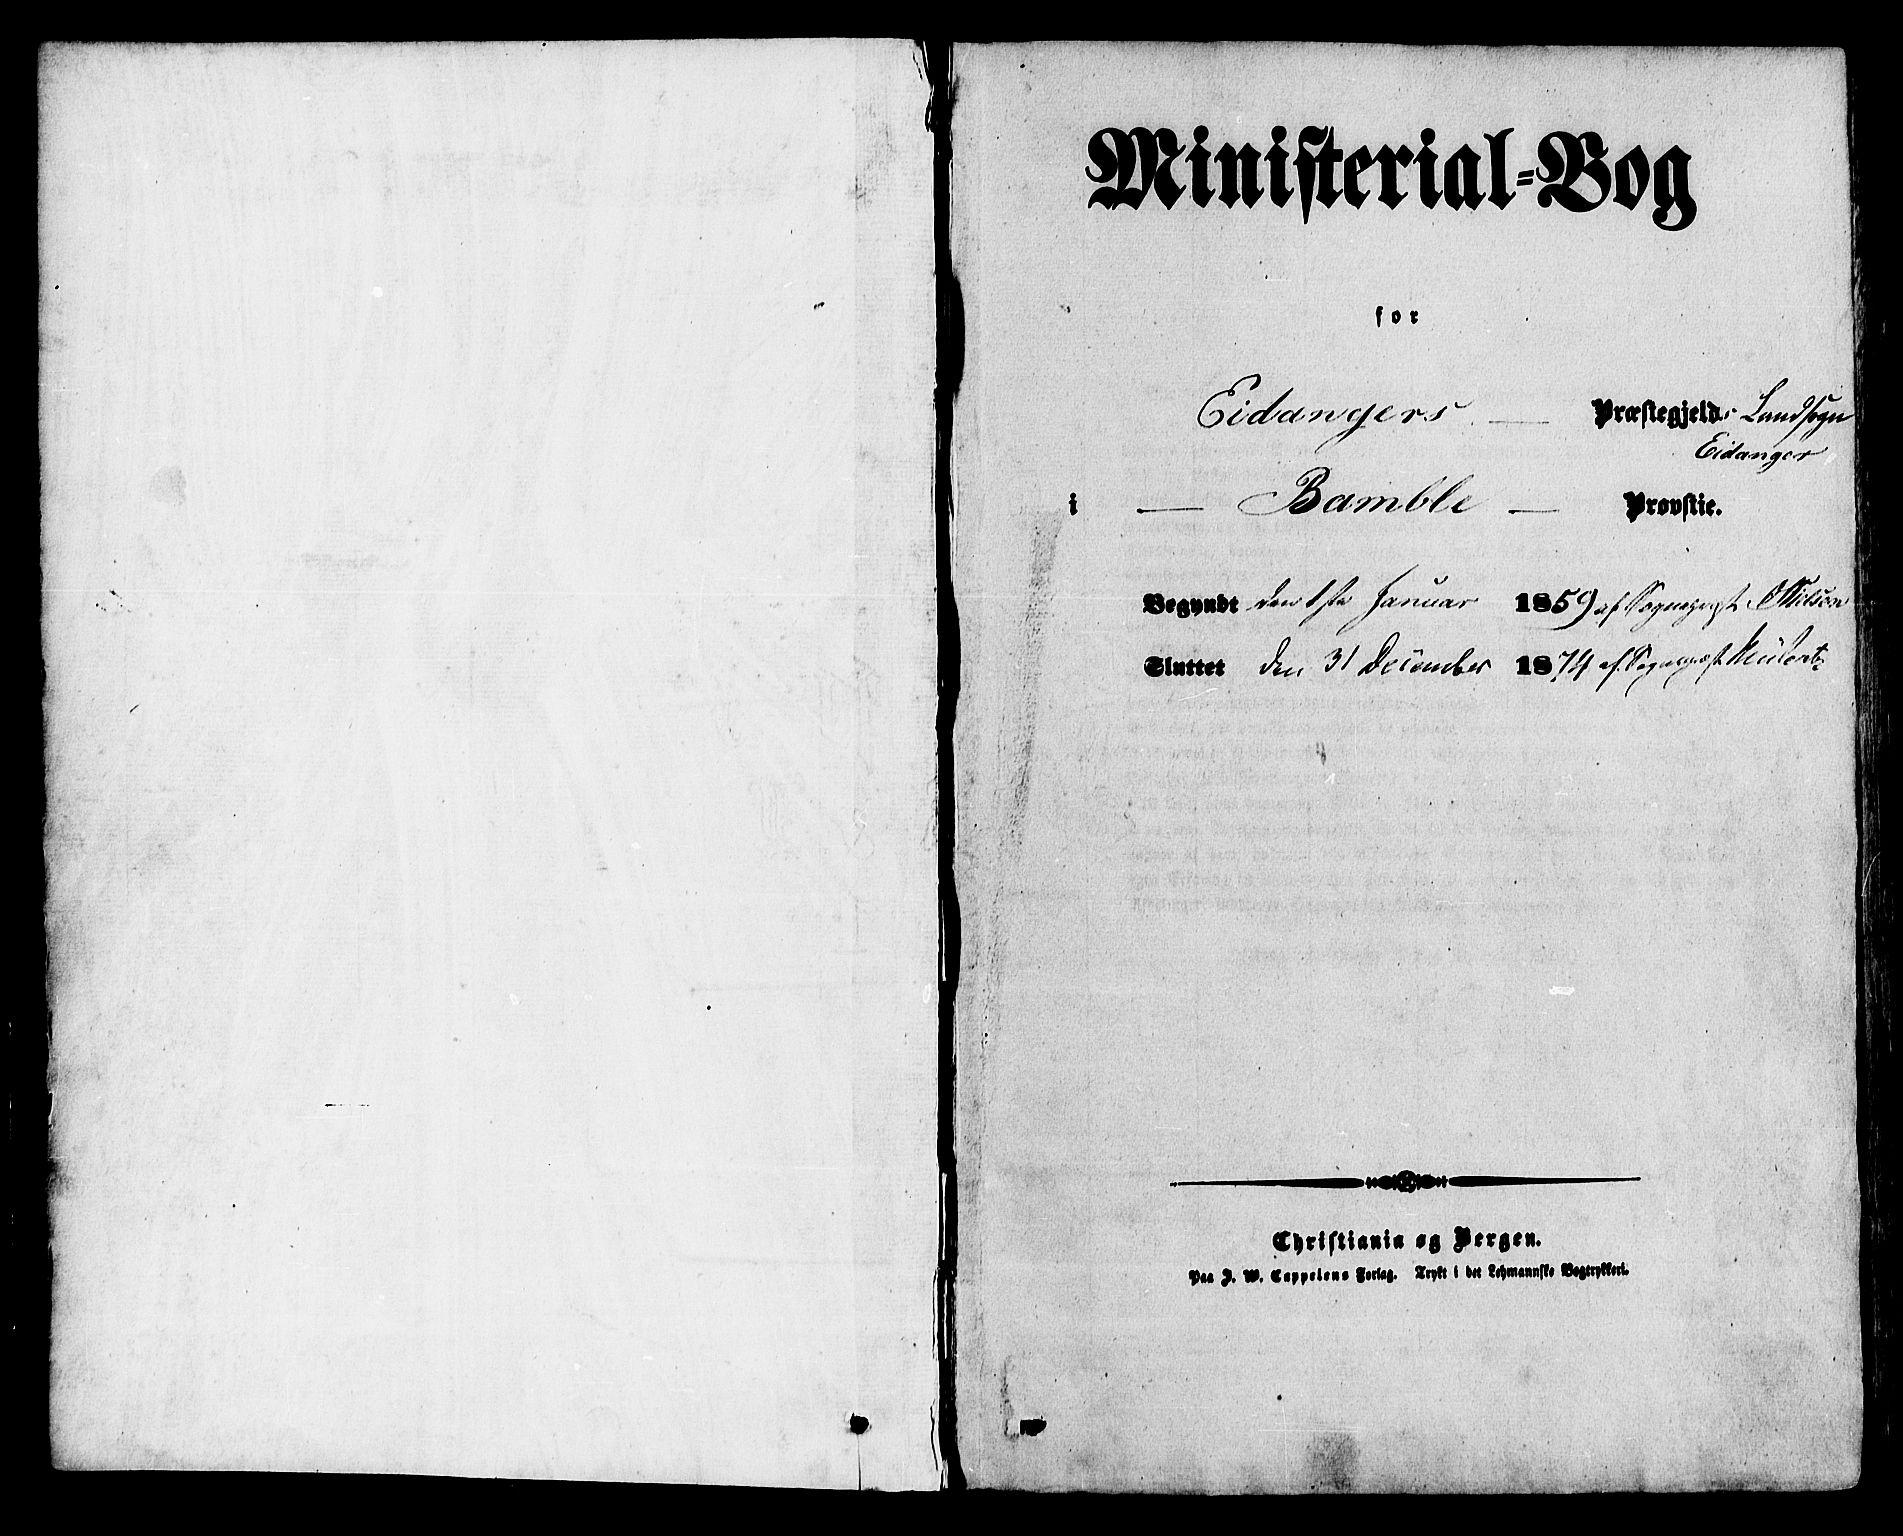 SAKO, Eidanger kirkebøker, F/Fa/L0010: Parish register (official) no. 10, 1859-1874